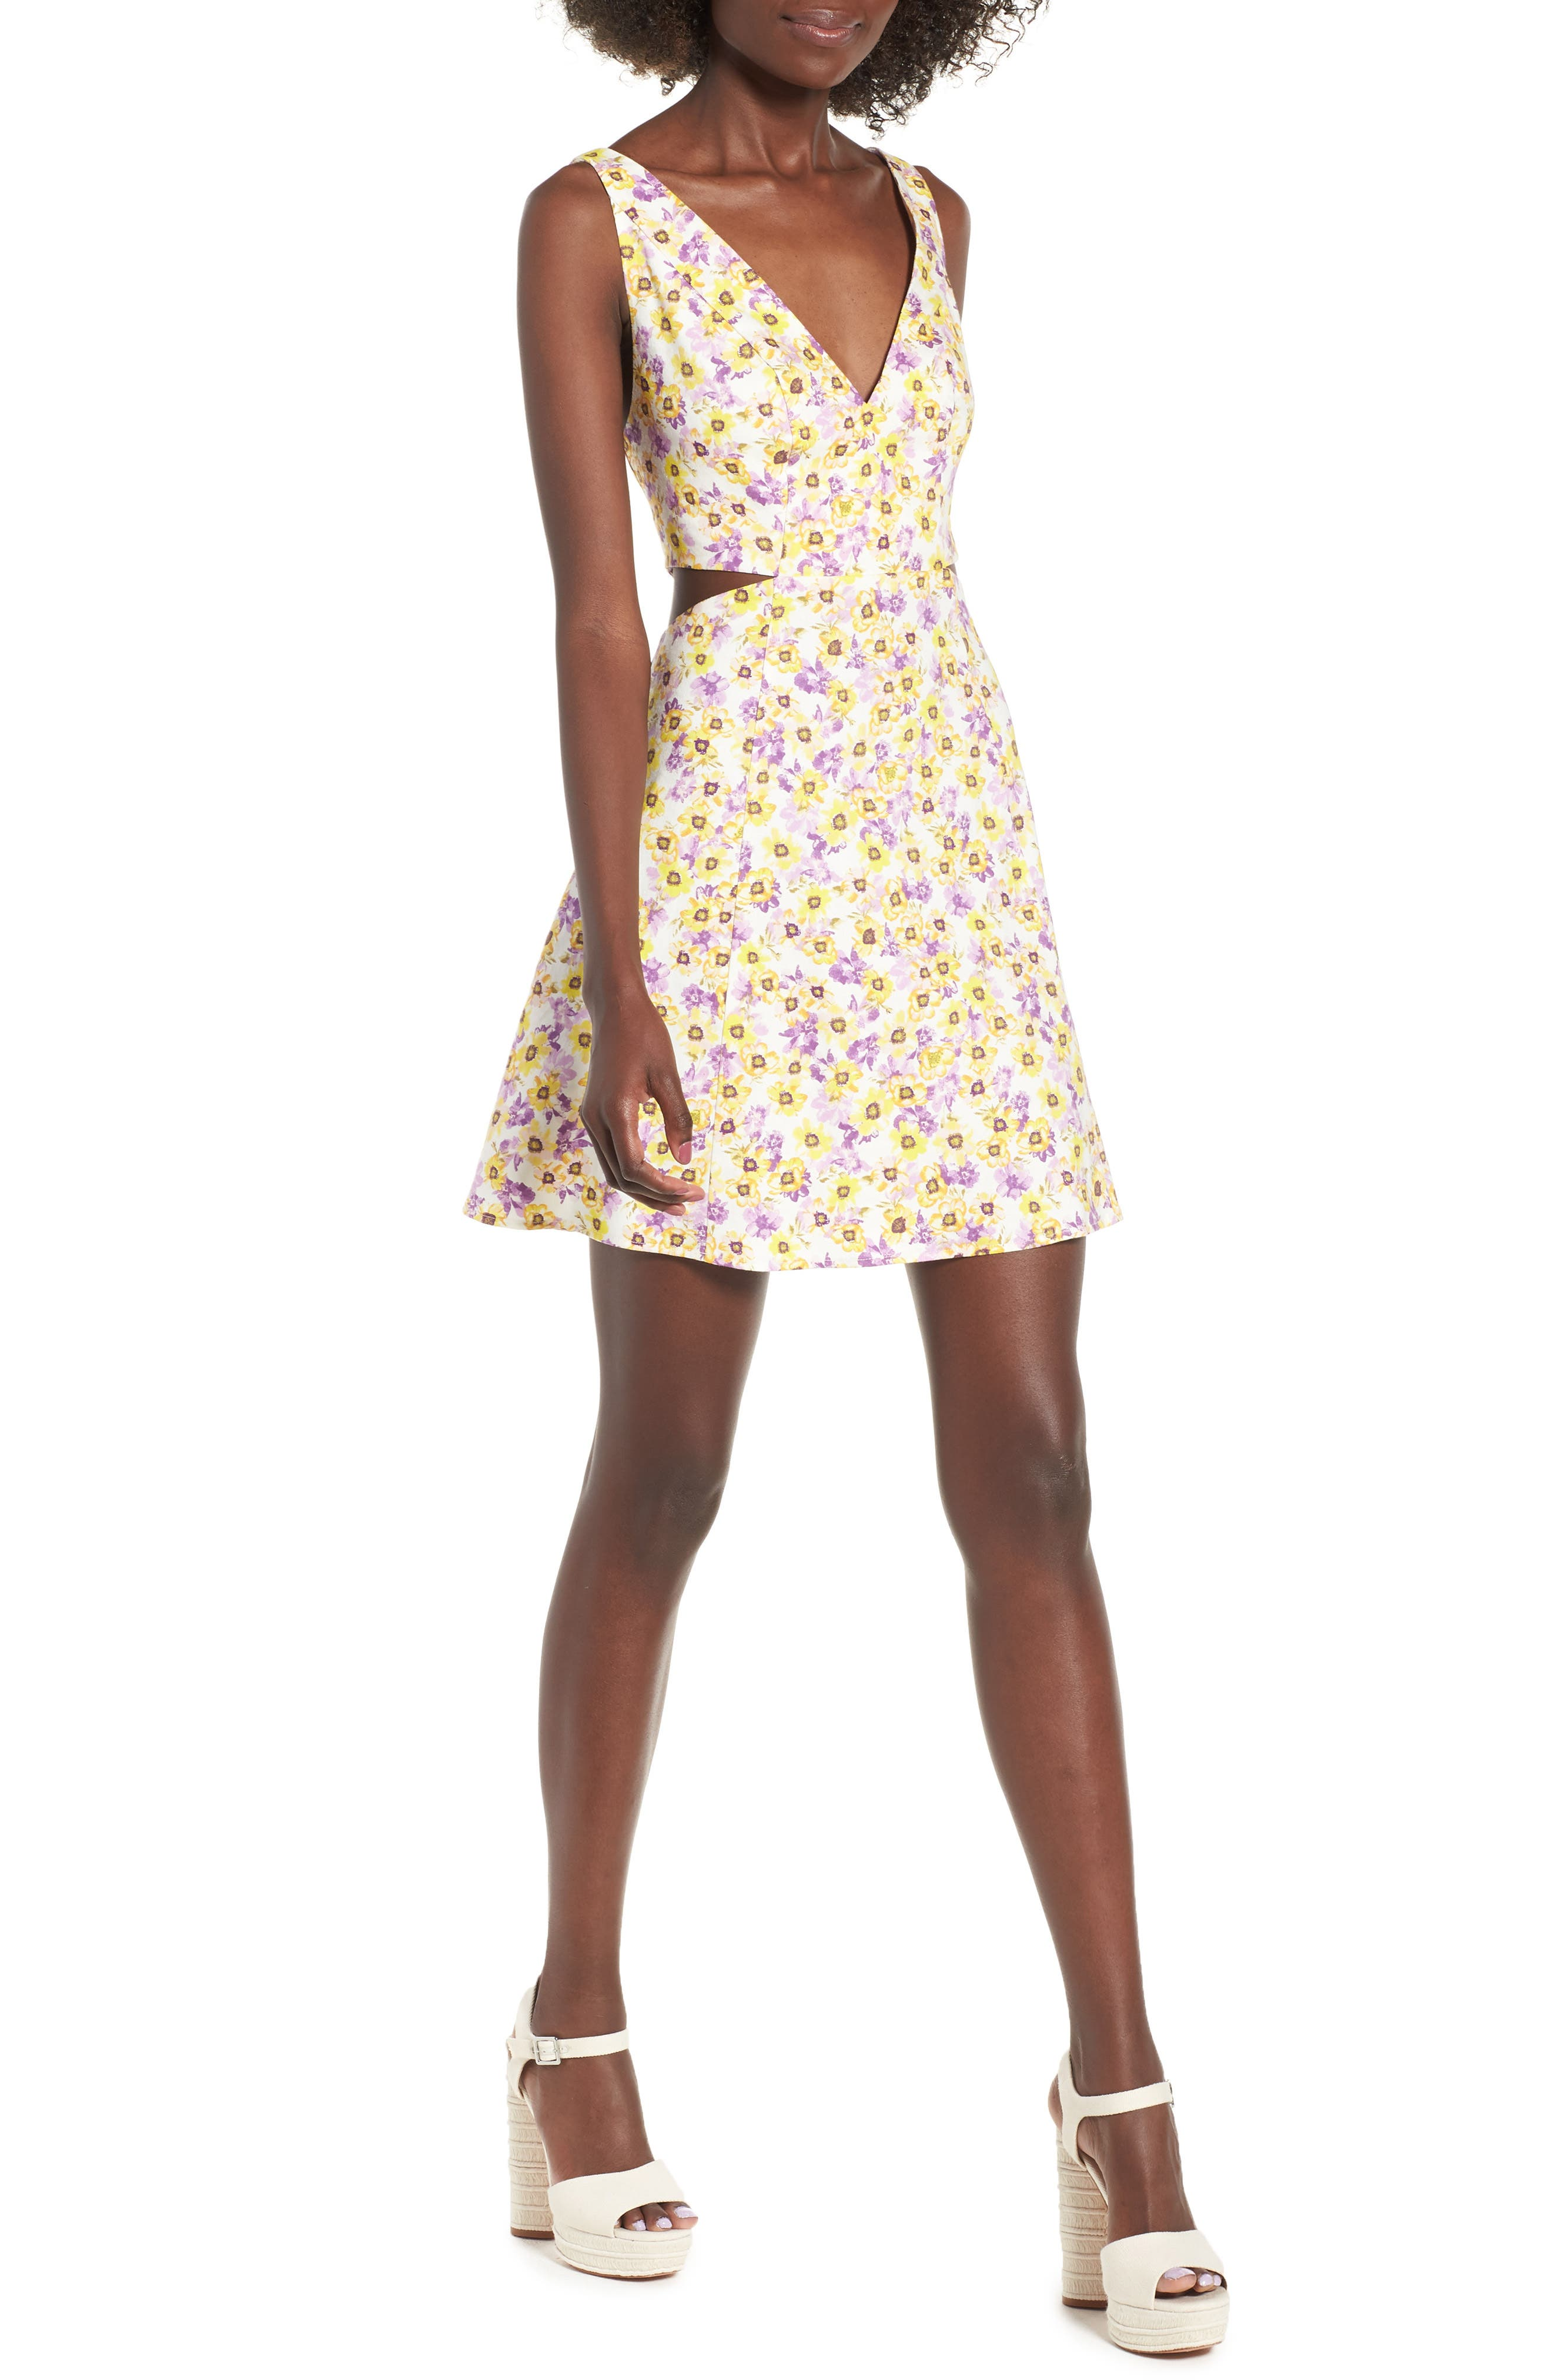 Rayanna Cutout Minidress,                             Main thumbnail 1, color,                             Yellow Garden